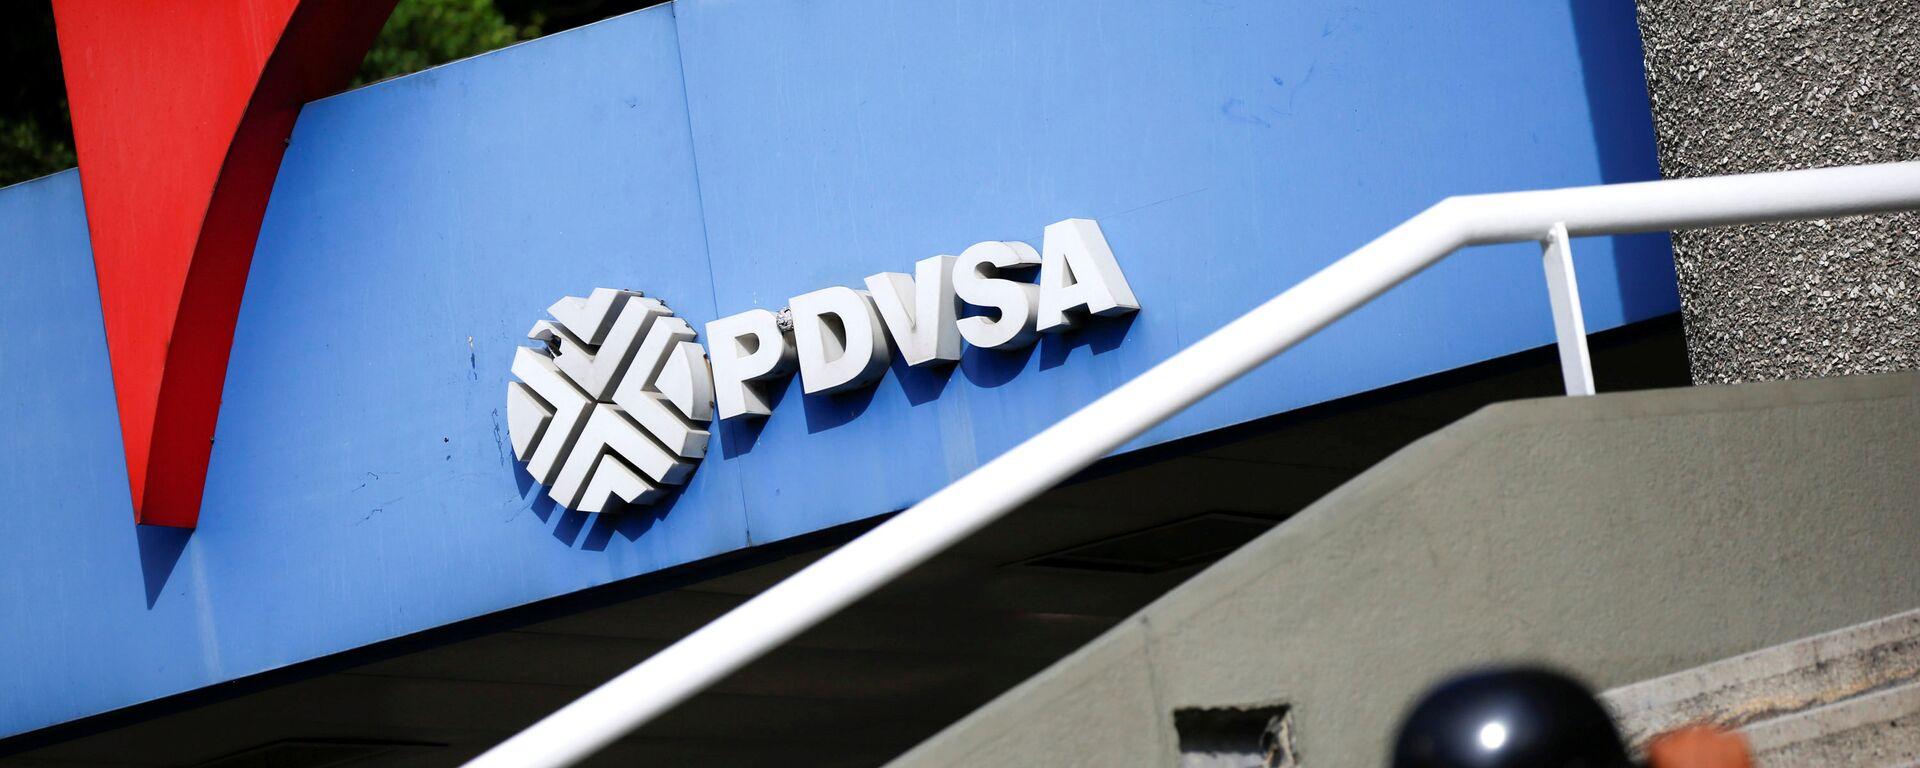 A man walks past a gas station with the logo of the Venezuelan state oil company PDVSA in Caracas, Venezuela December 23, 2016. REUTERS/Carlos Garcia Rawlins - Sputnik Mundo, 1920, 02.02.2021